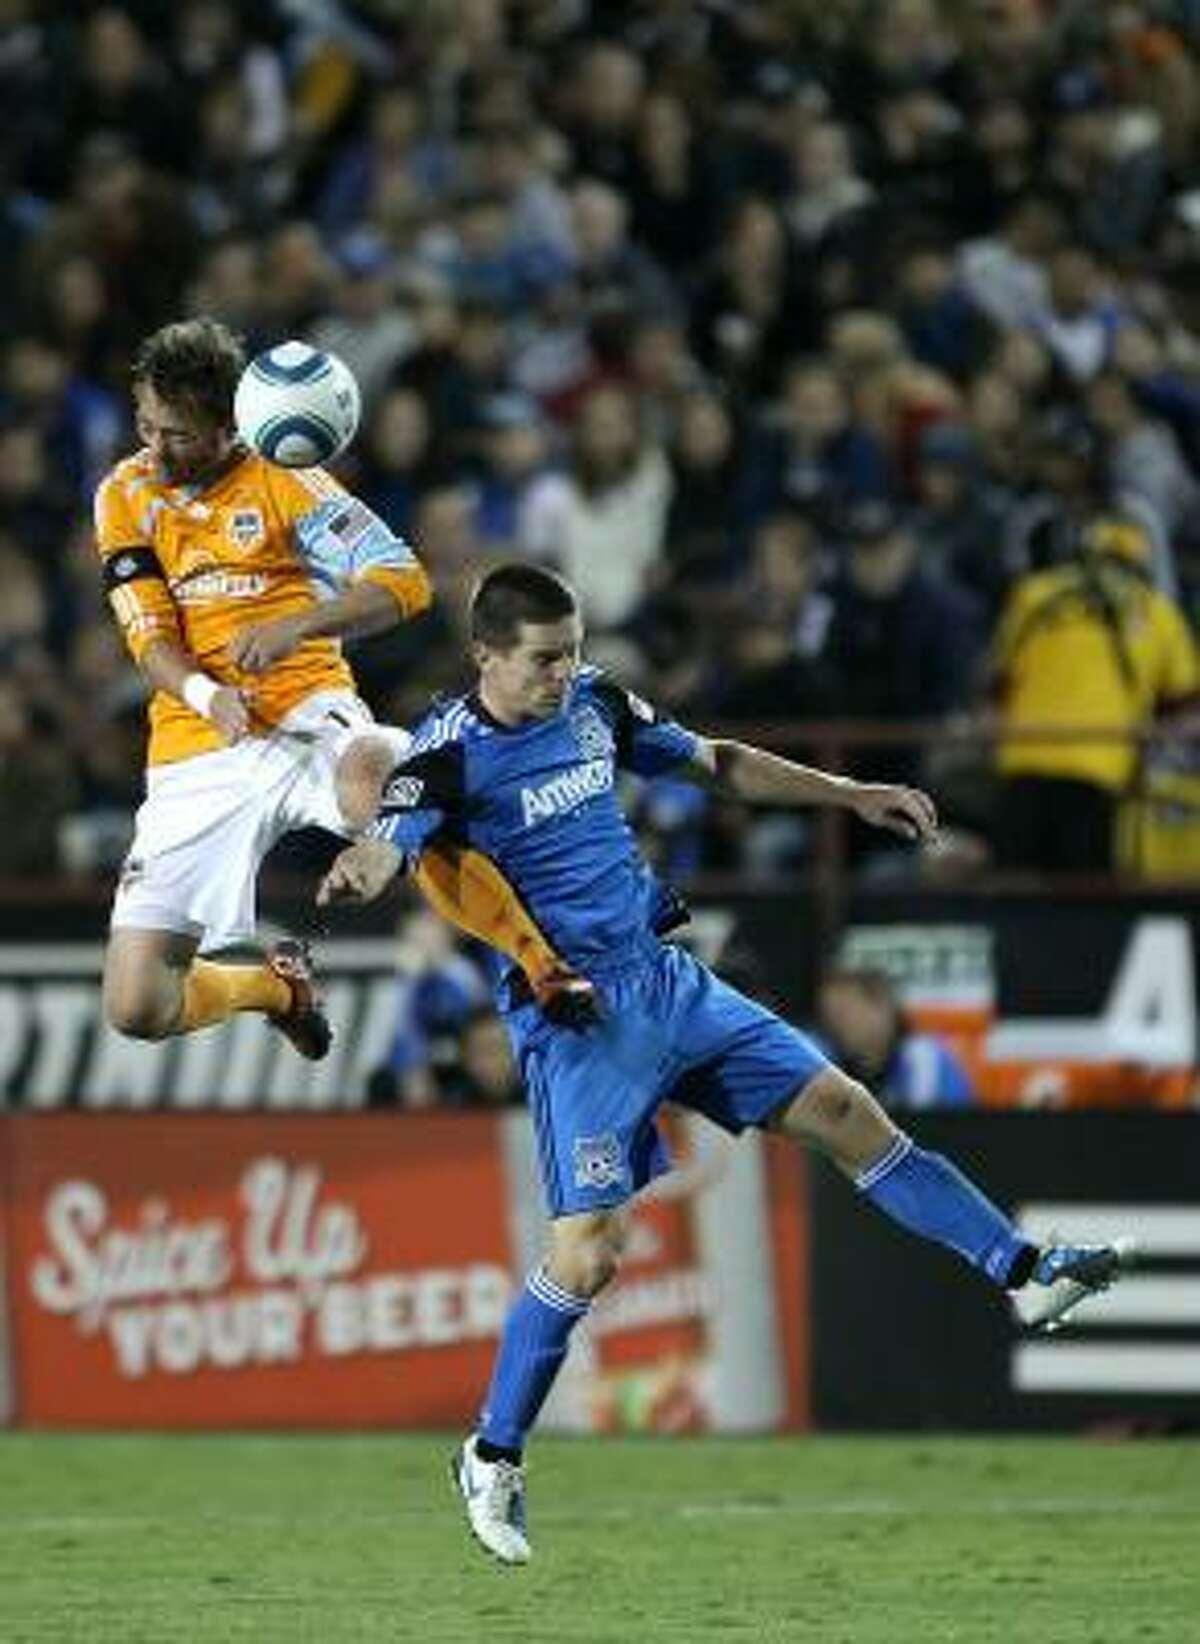 Dynamo midfielder Brad Davis, left, and San Jose's Sam Cronin go up for the ball.